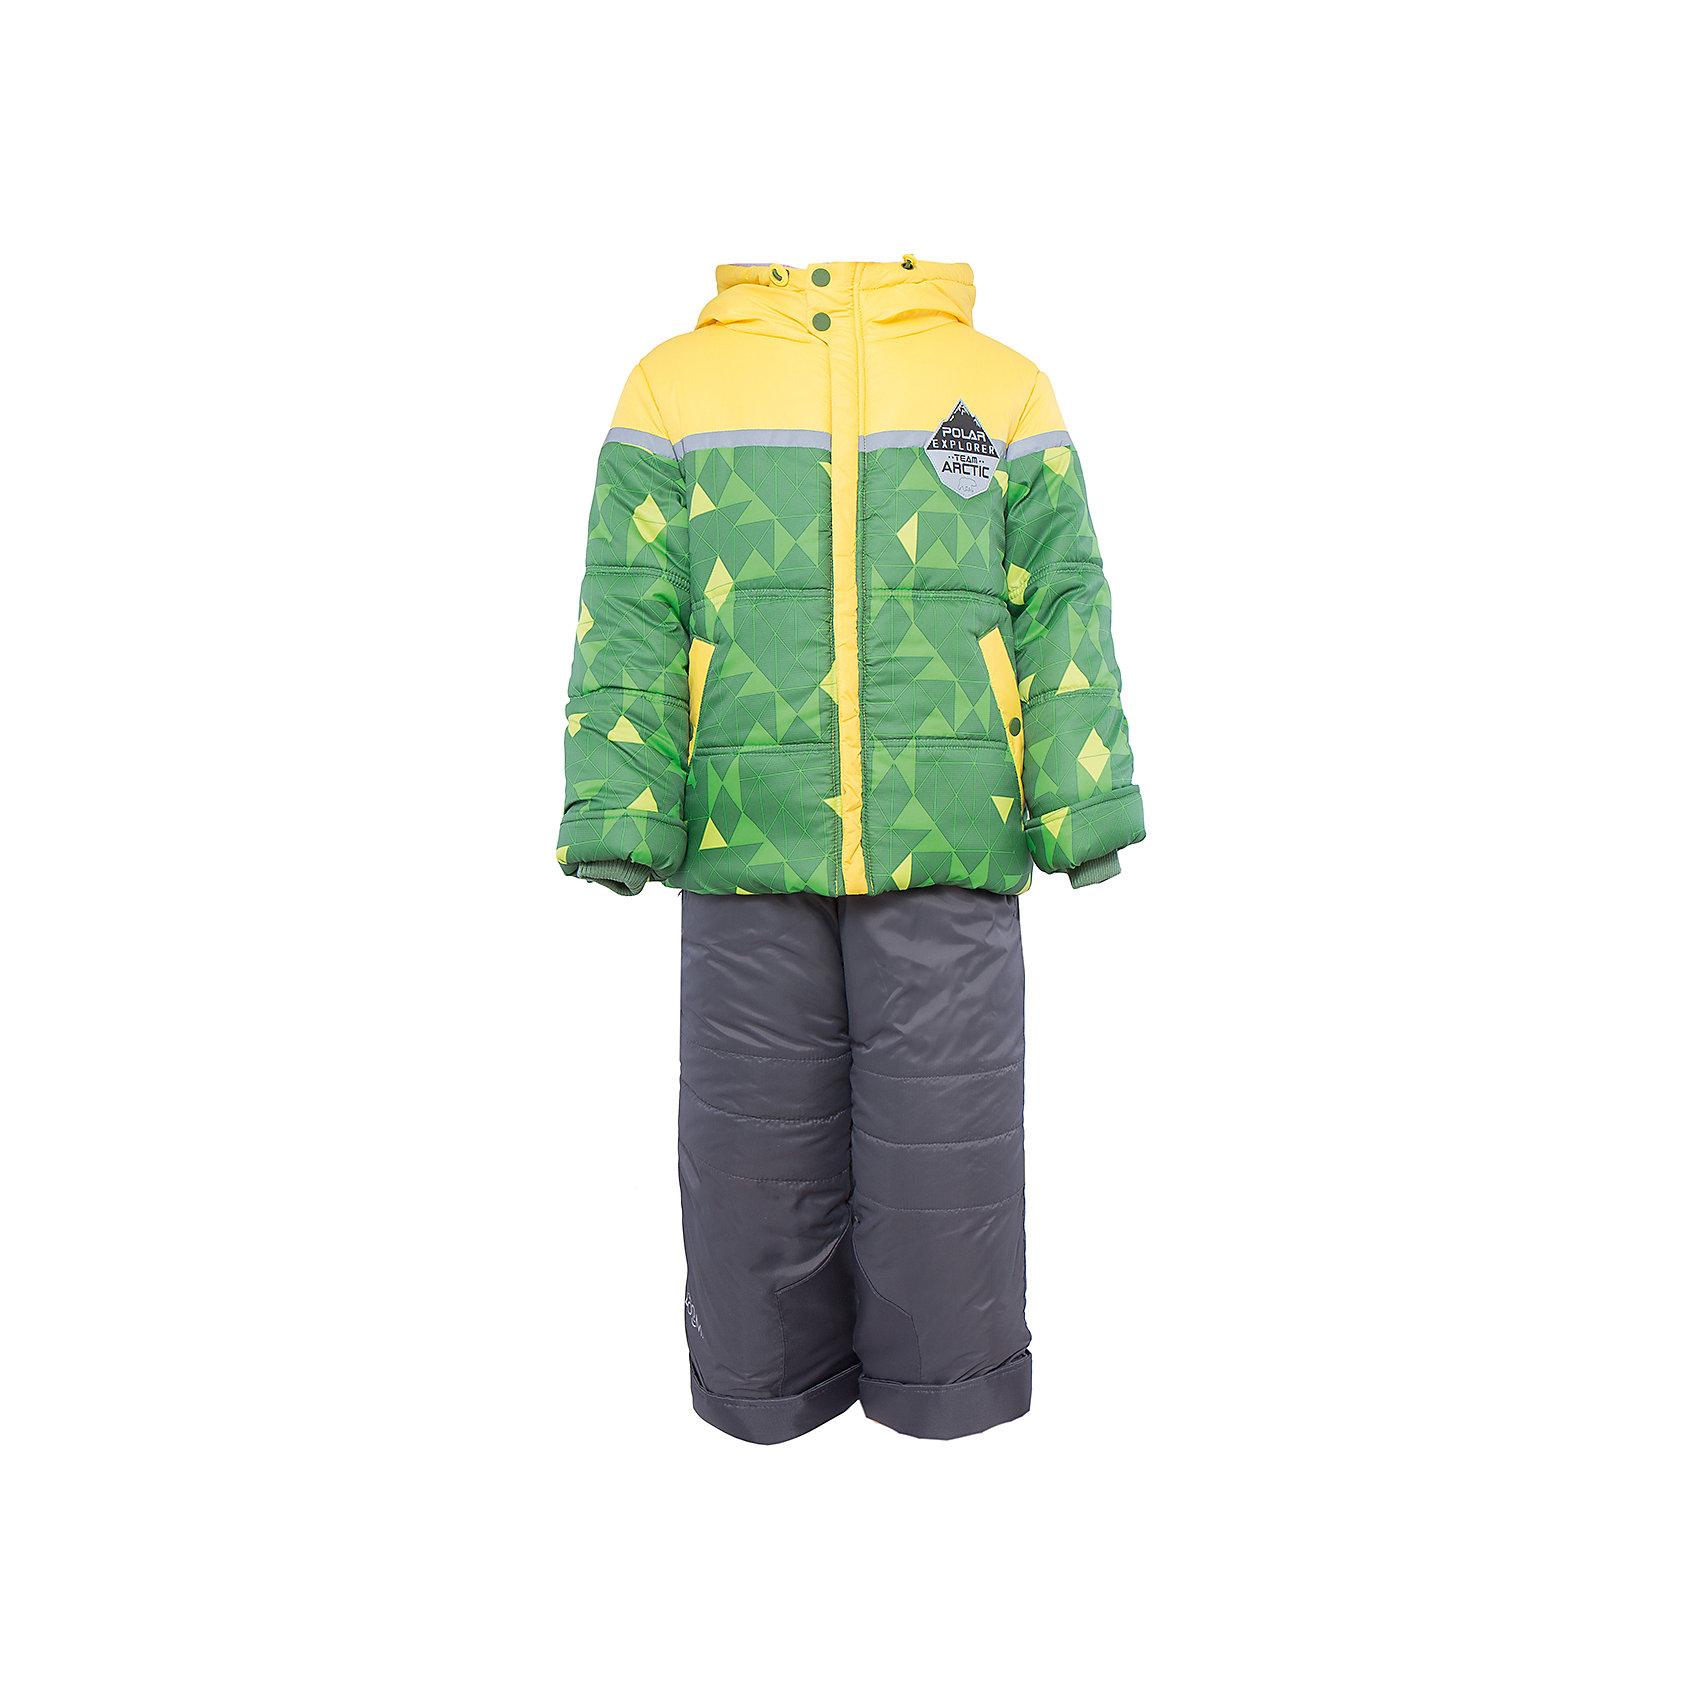 BOOM by Orby Комплект: курта и брюки для мальчика BOOM by Orby boom by orby комплект курта и брюки для девочки boom by orby